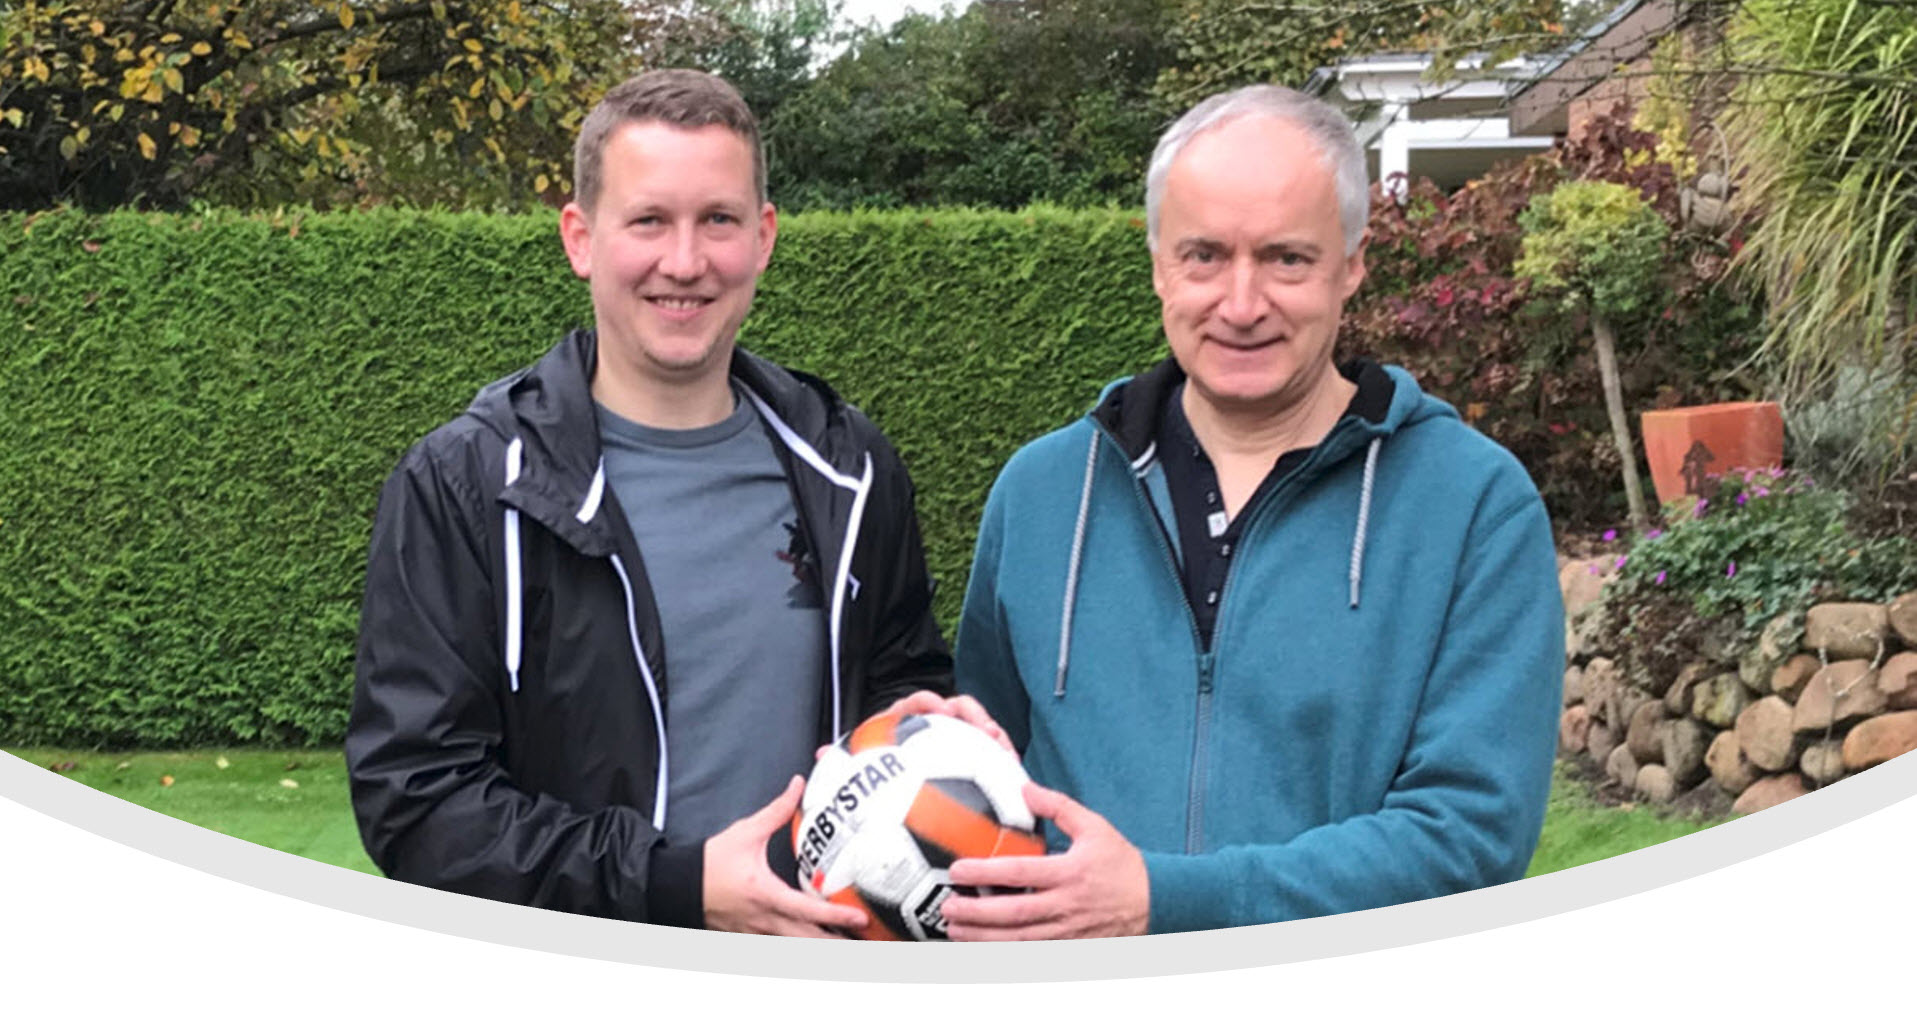 Dennis Bardowicks ist neuer Jugendfußball-Obmann